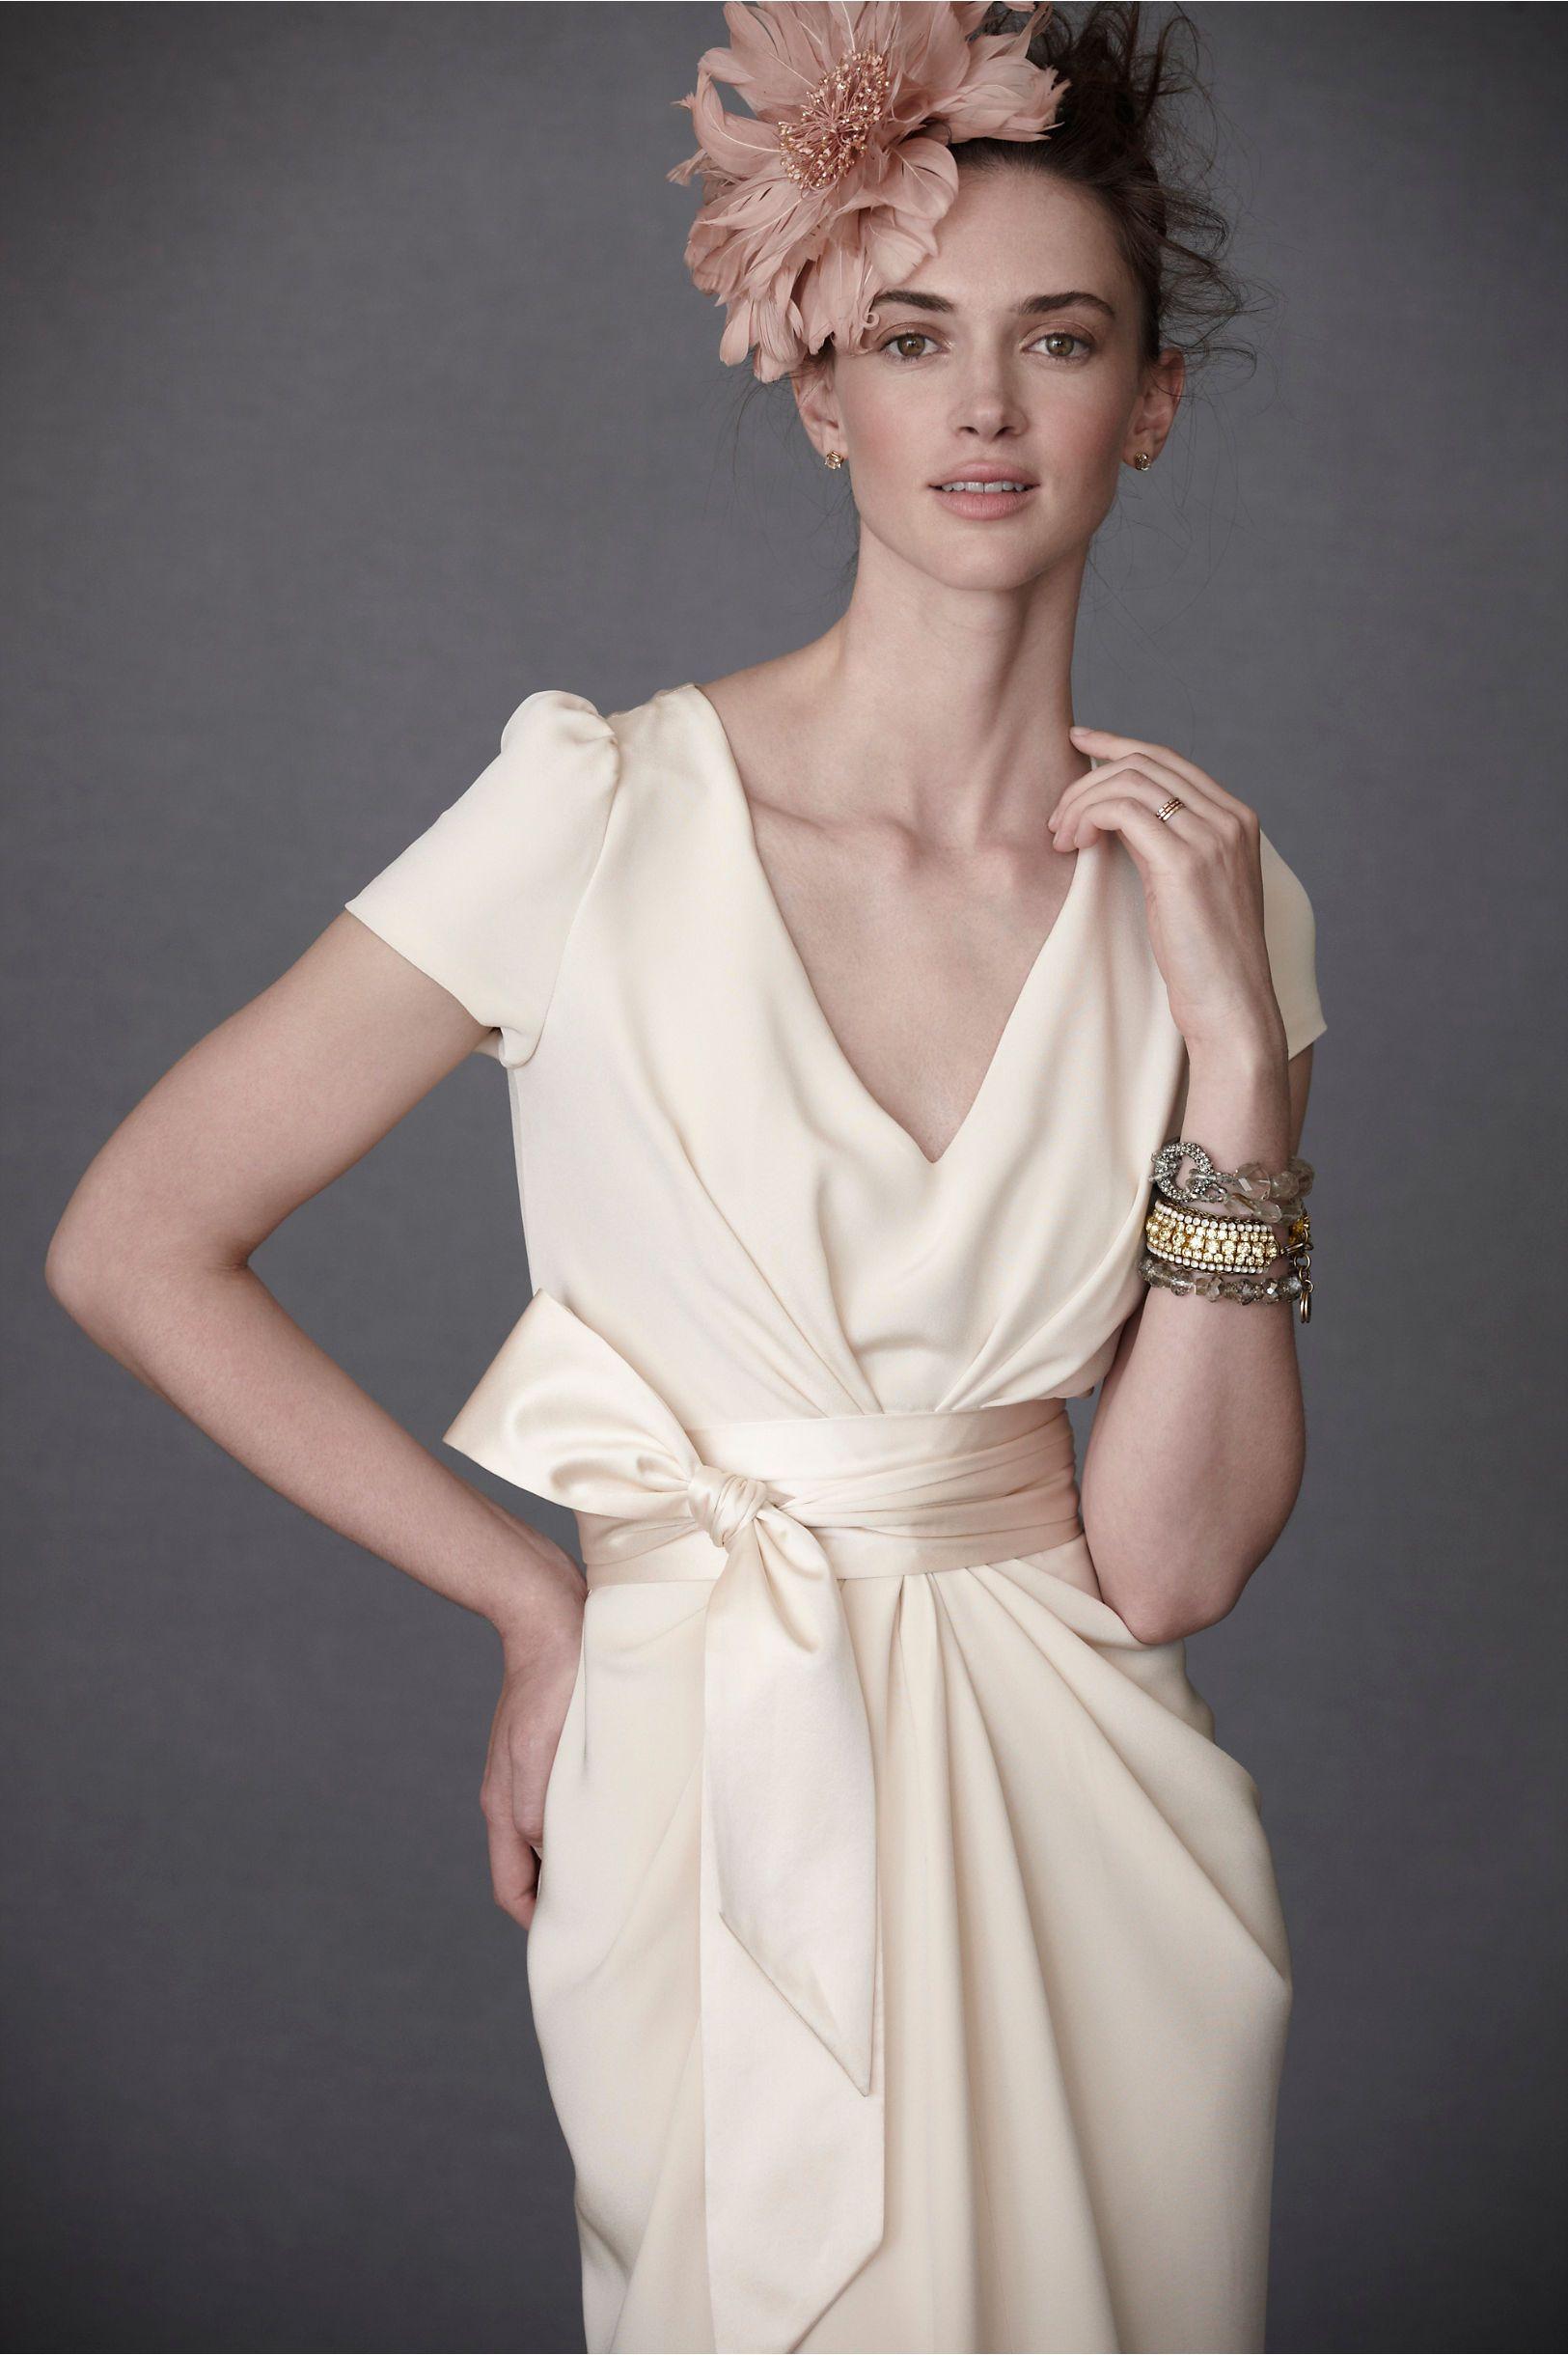 Silk sheath wedding dress  silk crepe bow wedding dress  th wedding anniversary  Pinterest